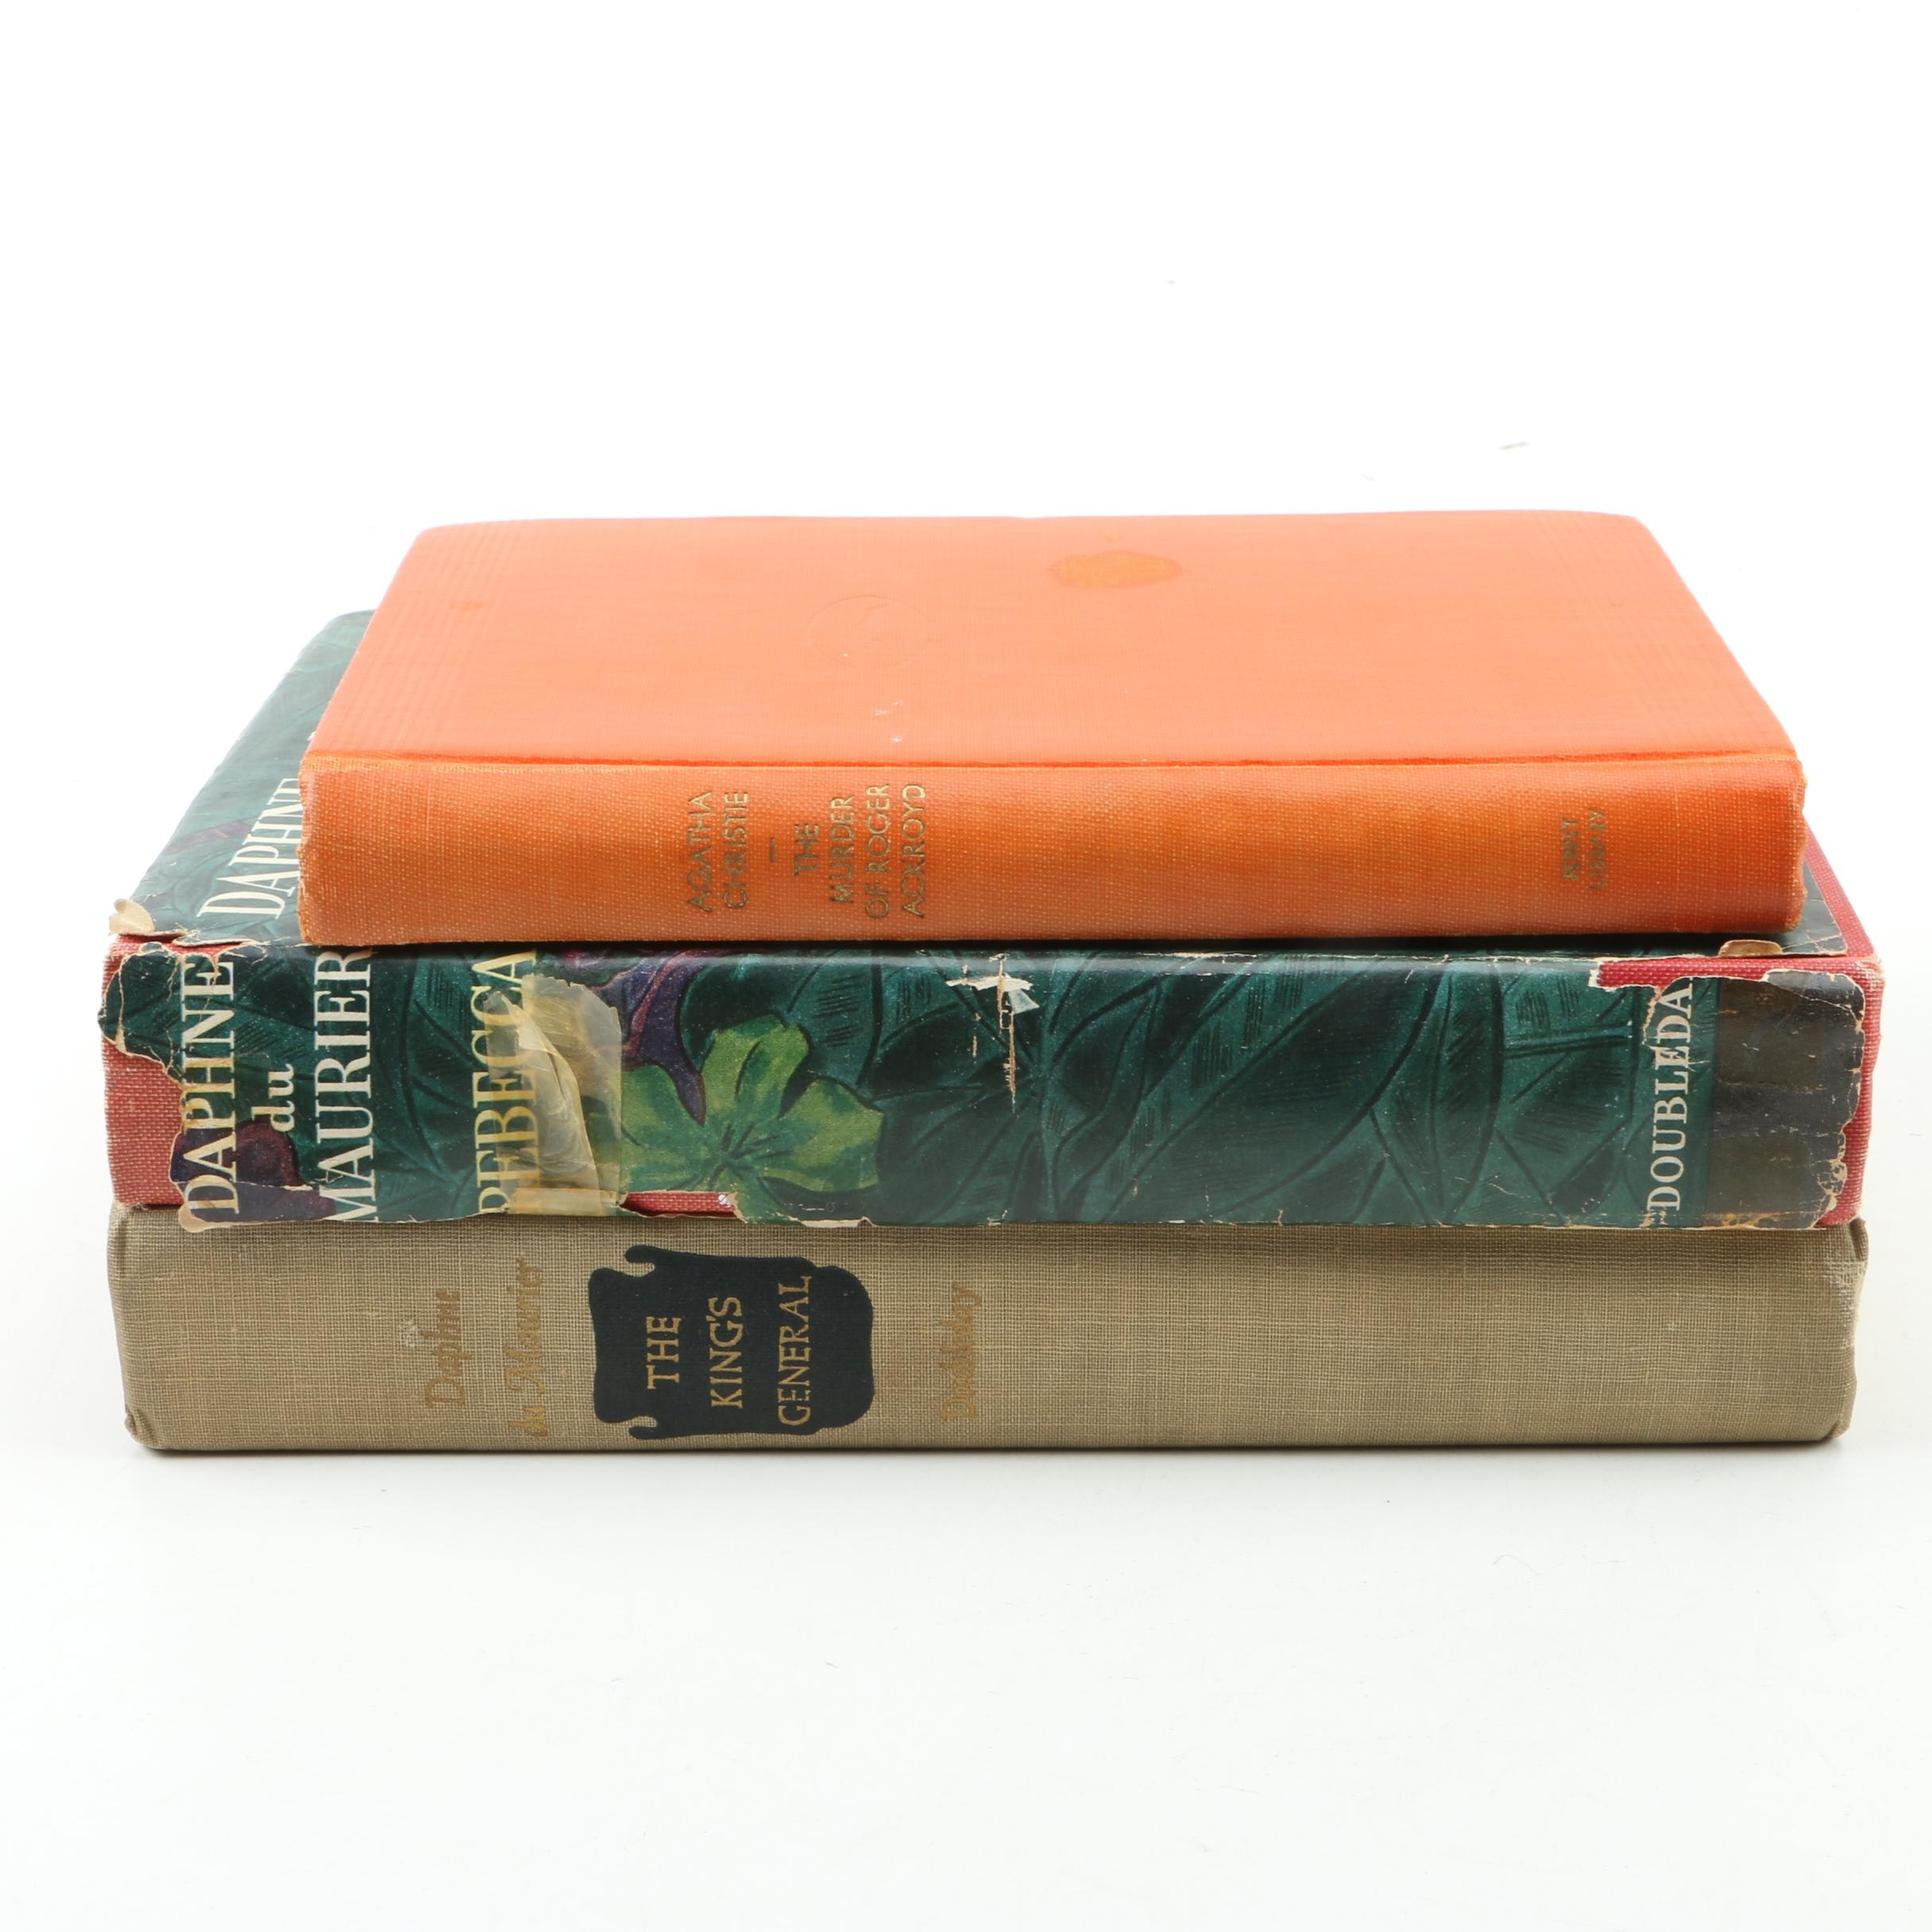 "Books Including ""Rebecca"" by Daphne du Maurier"